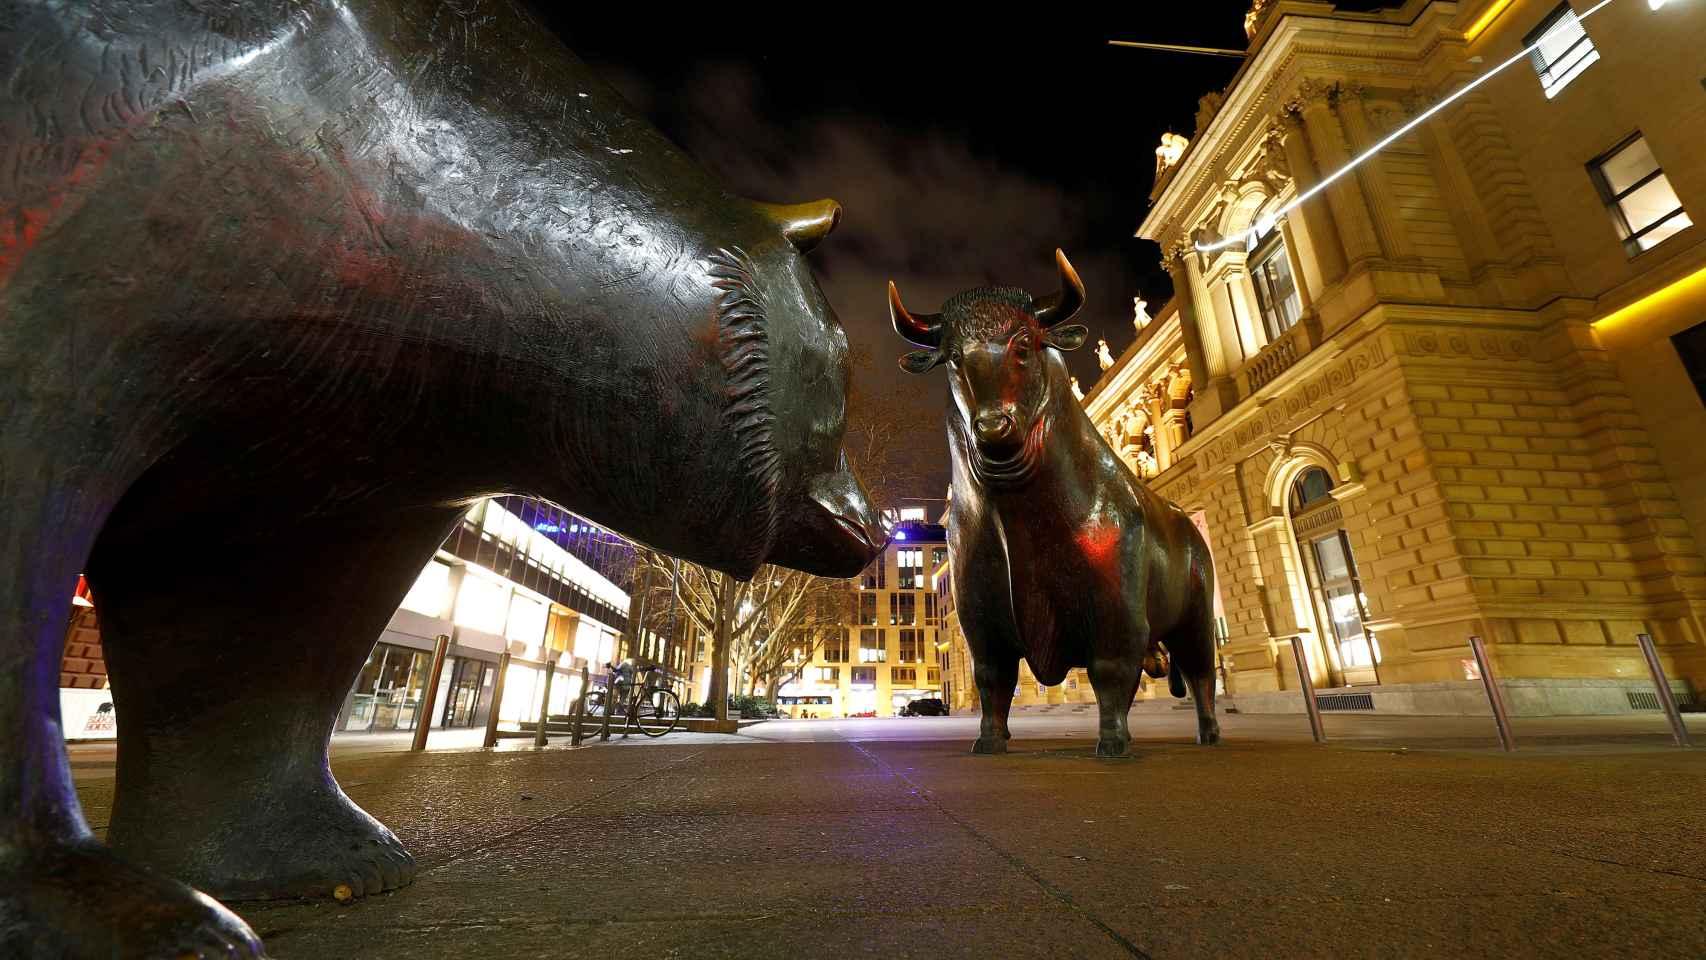 Monumento al oso y al toro frente a la Bolsa de Fráncfort.